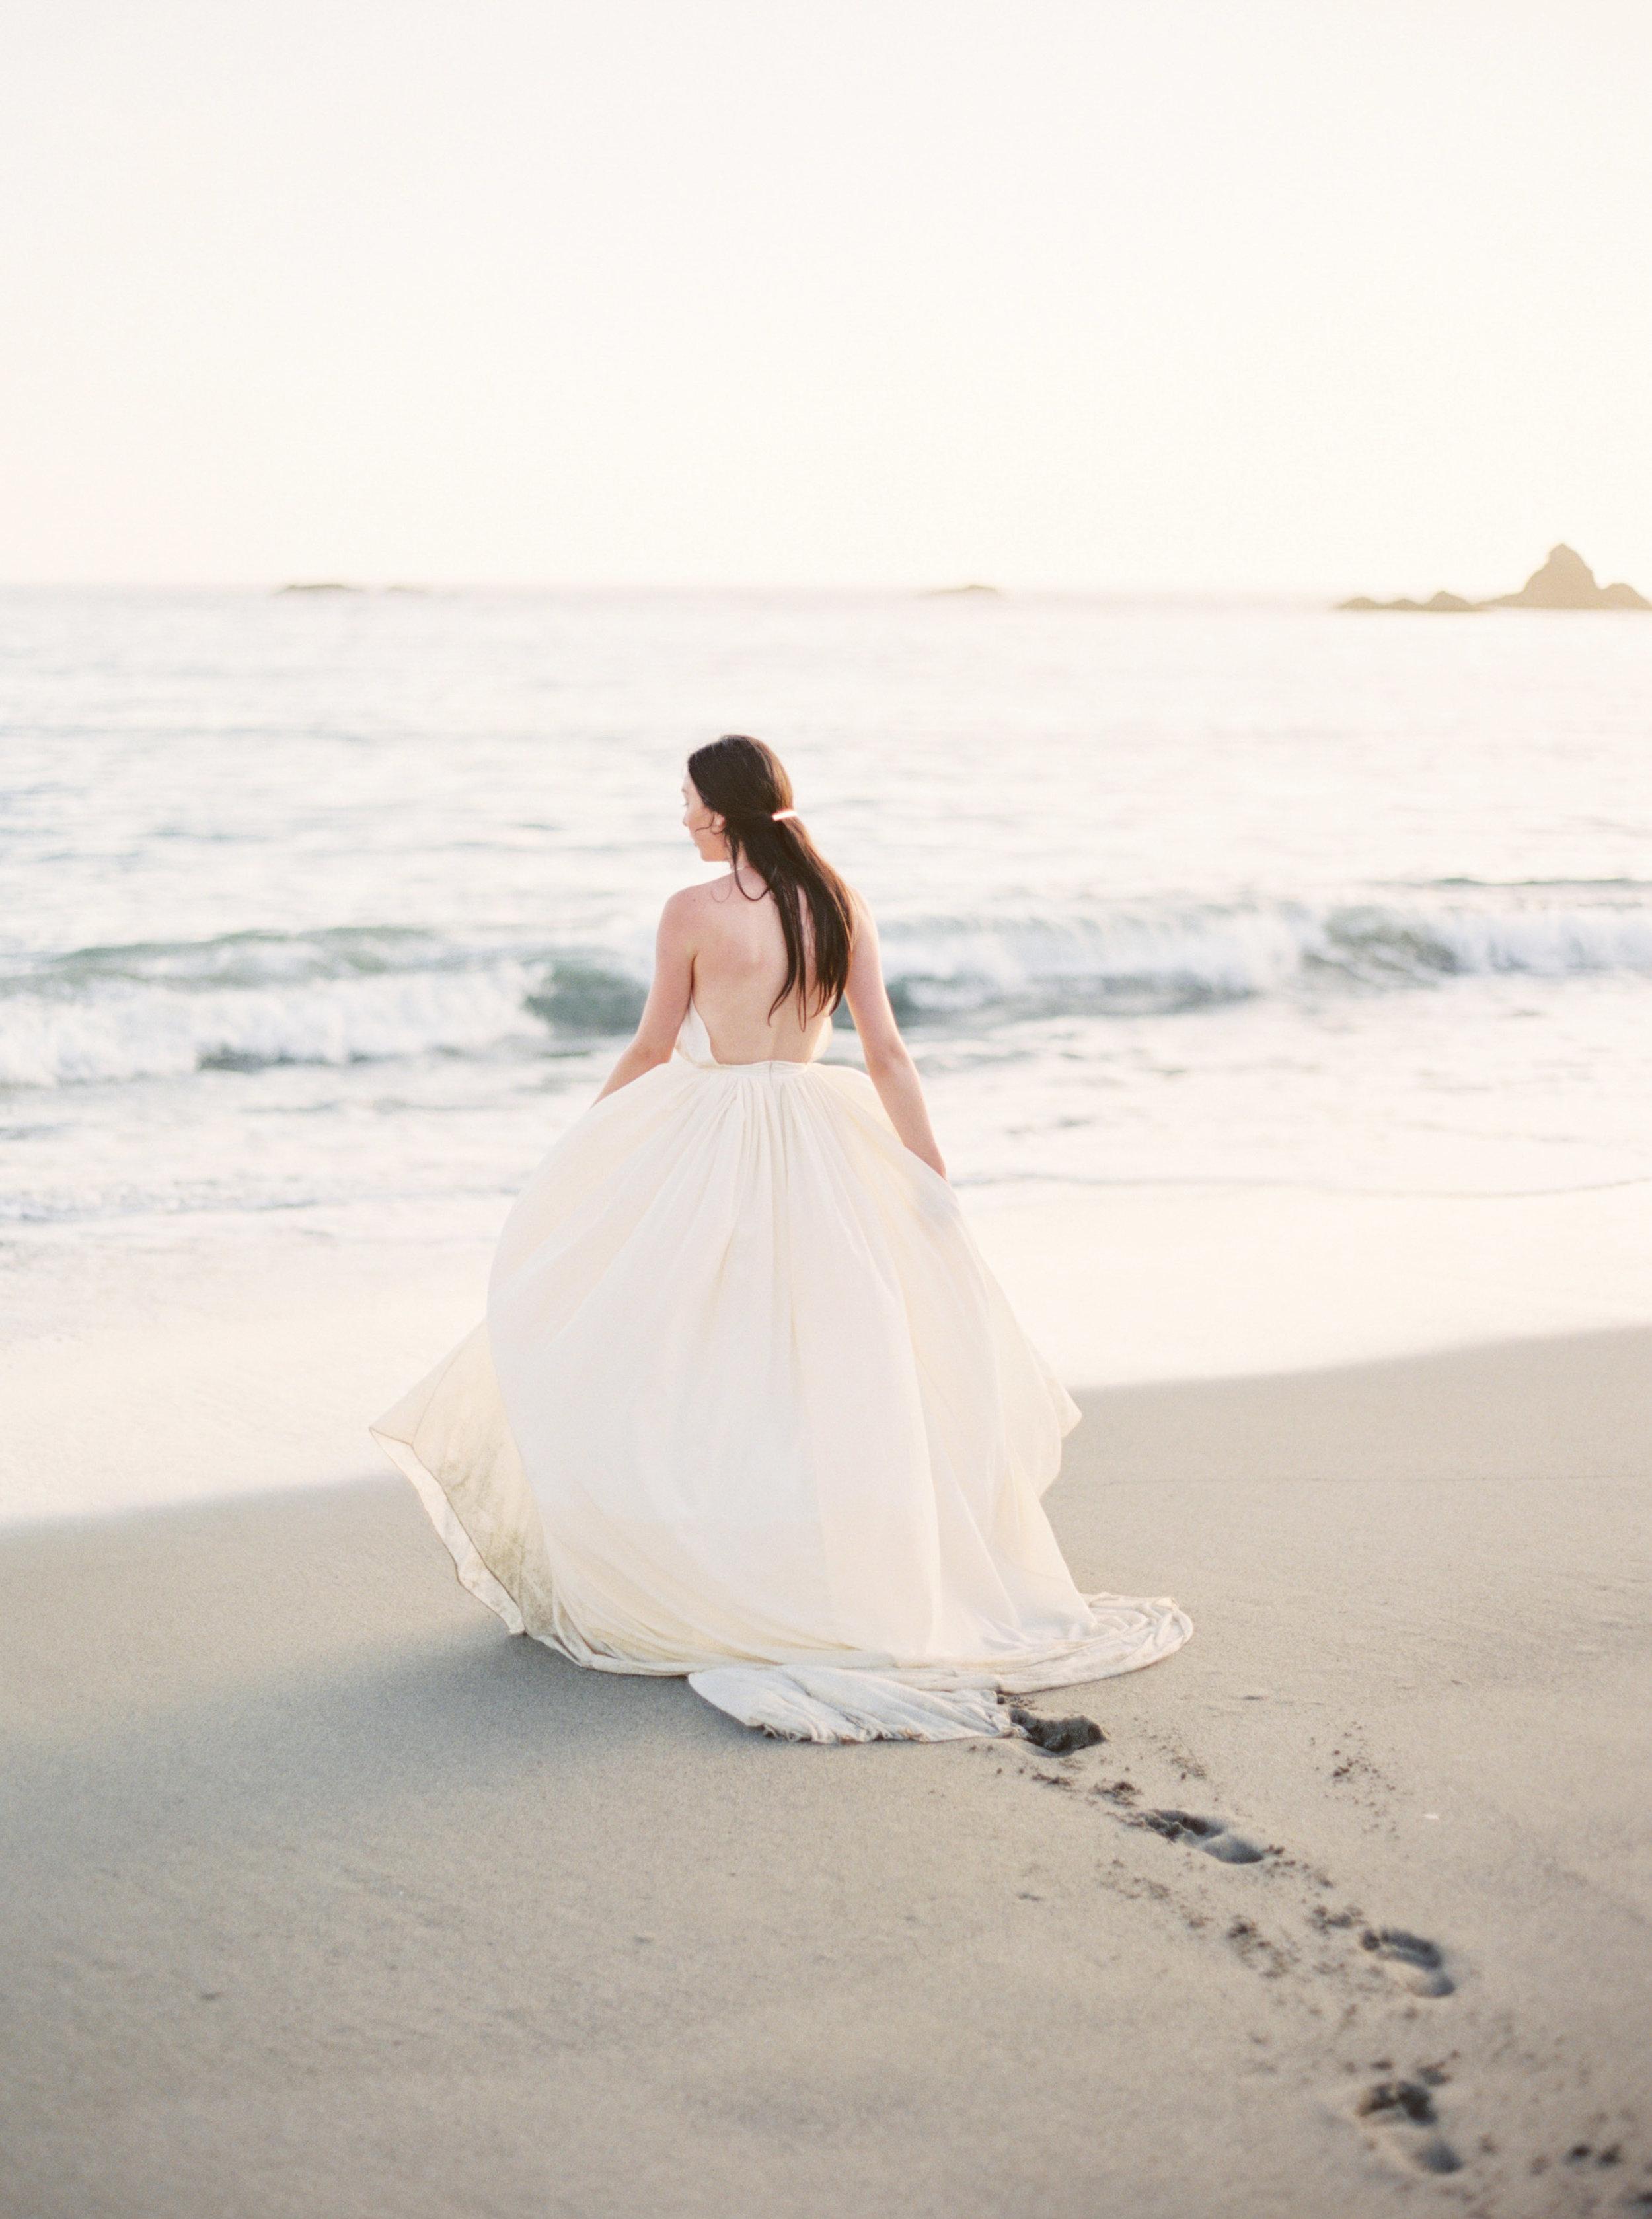 Lisa Catherine Photography - Joy Wed Listing_8.jpg